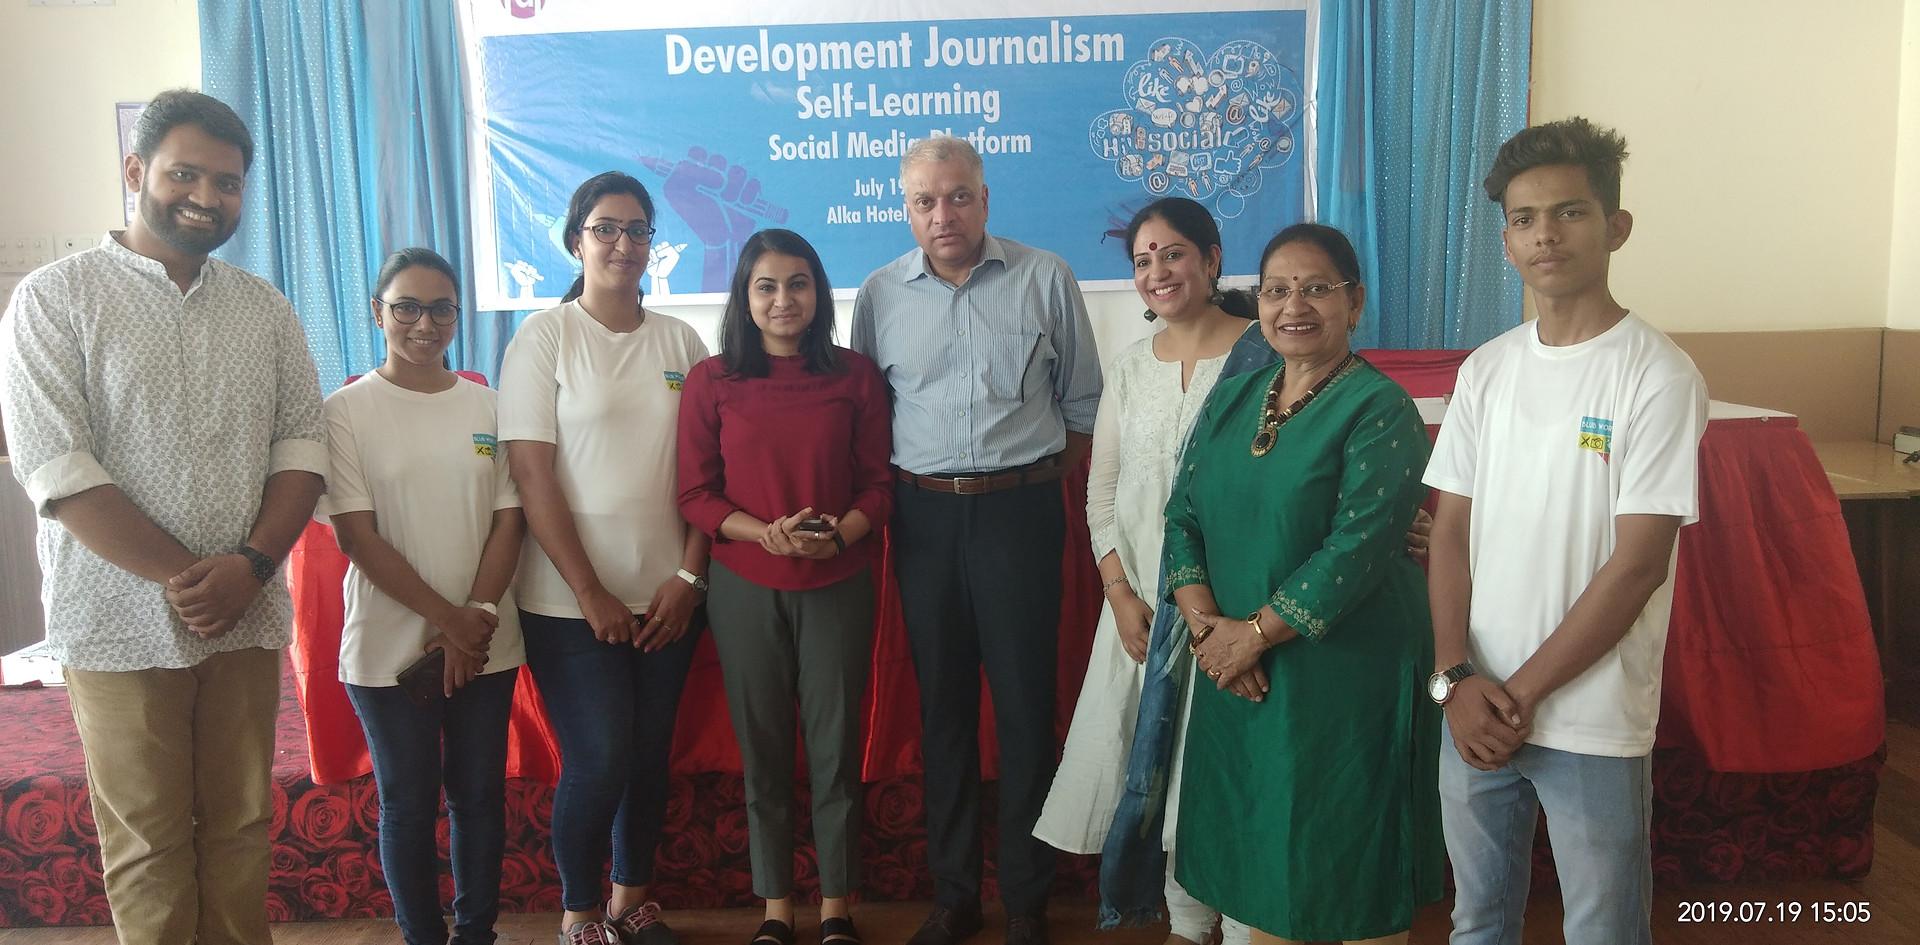 Mr. Pankaj Pachauri Founder 7 Editor-in Chief, Go News with the Team of Blub World